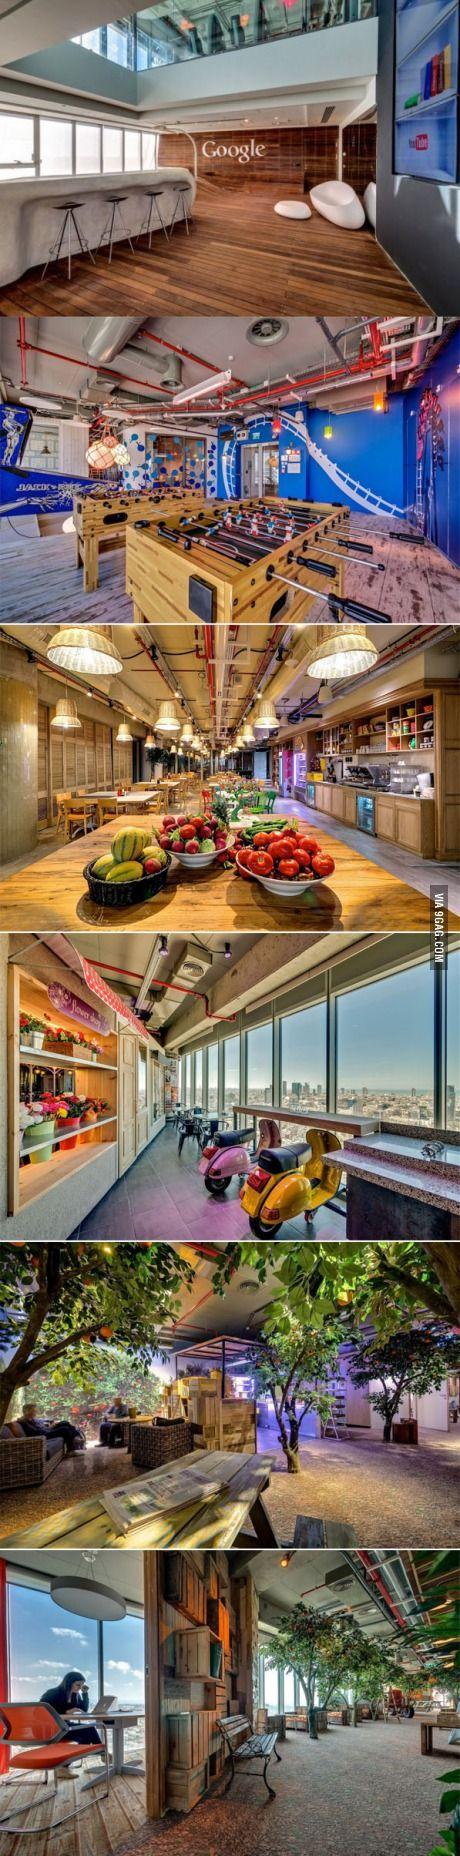 google tel aviv offices rock. 123 Best 企業 ◇ Google Images On Pinterest | Doodles, Exercises And Art Tel Aviv Offices Rock